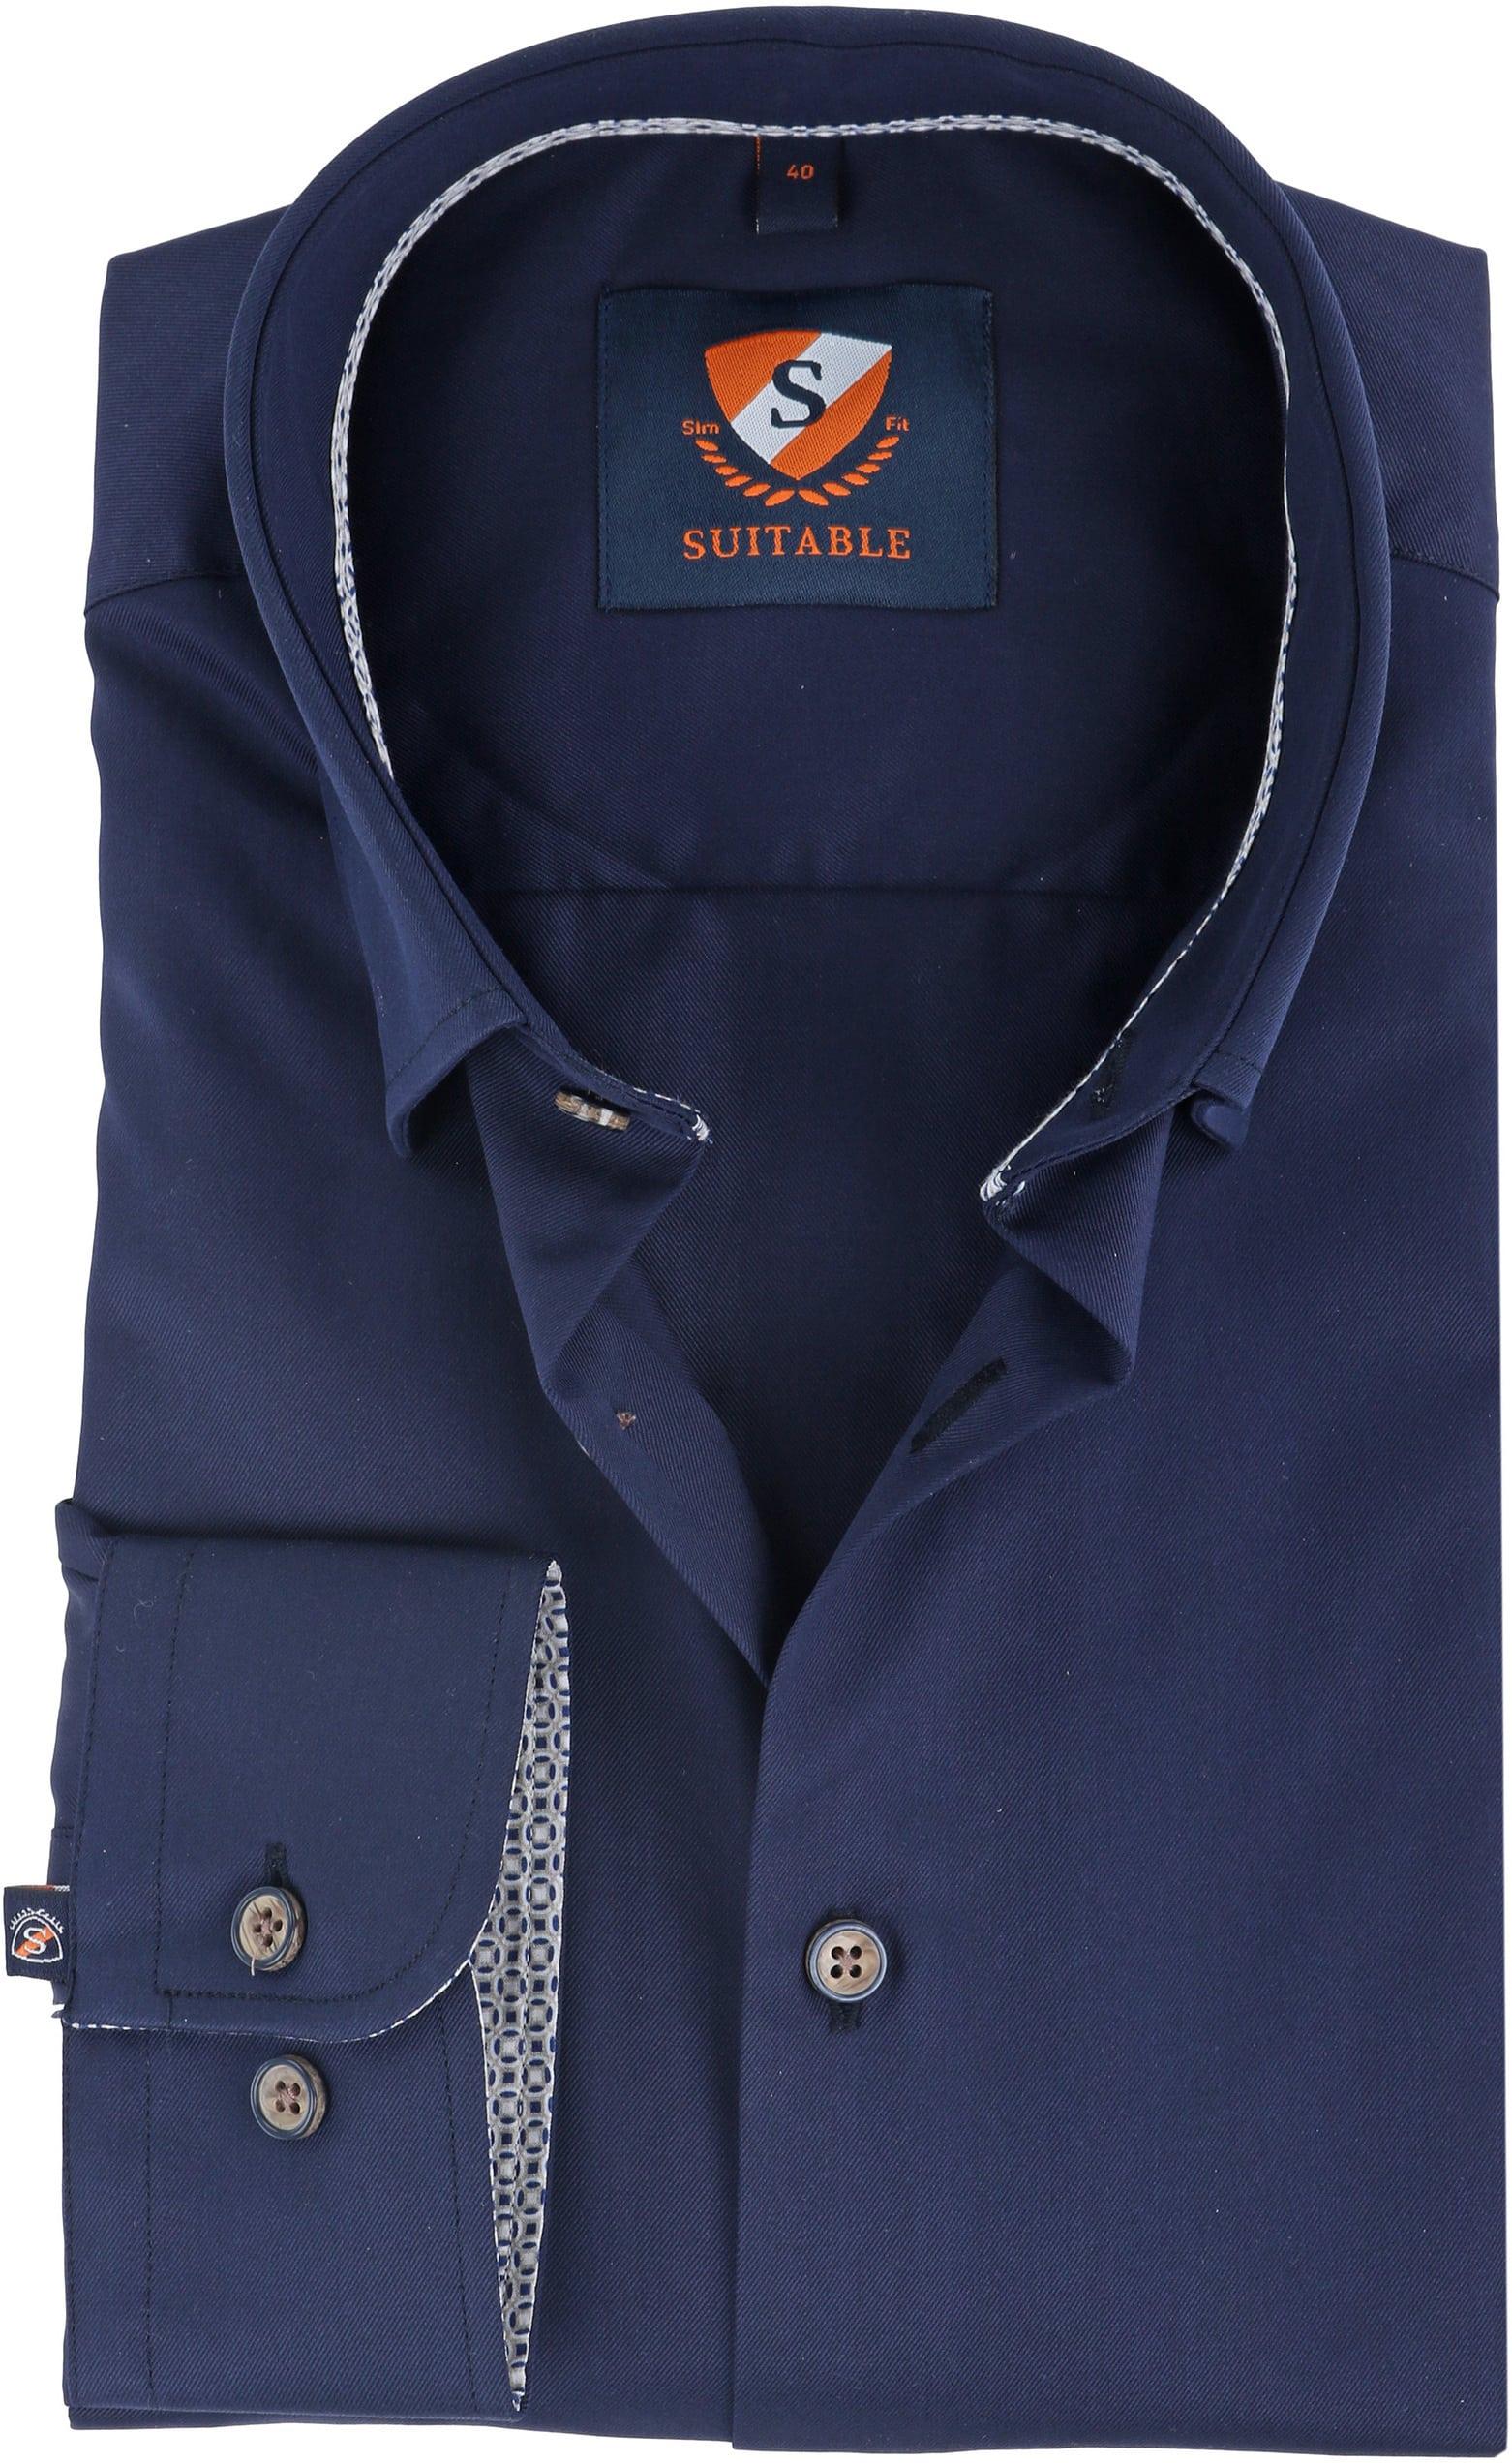 Suitable Overhemd Navy HBD foto 0